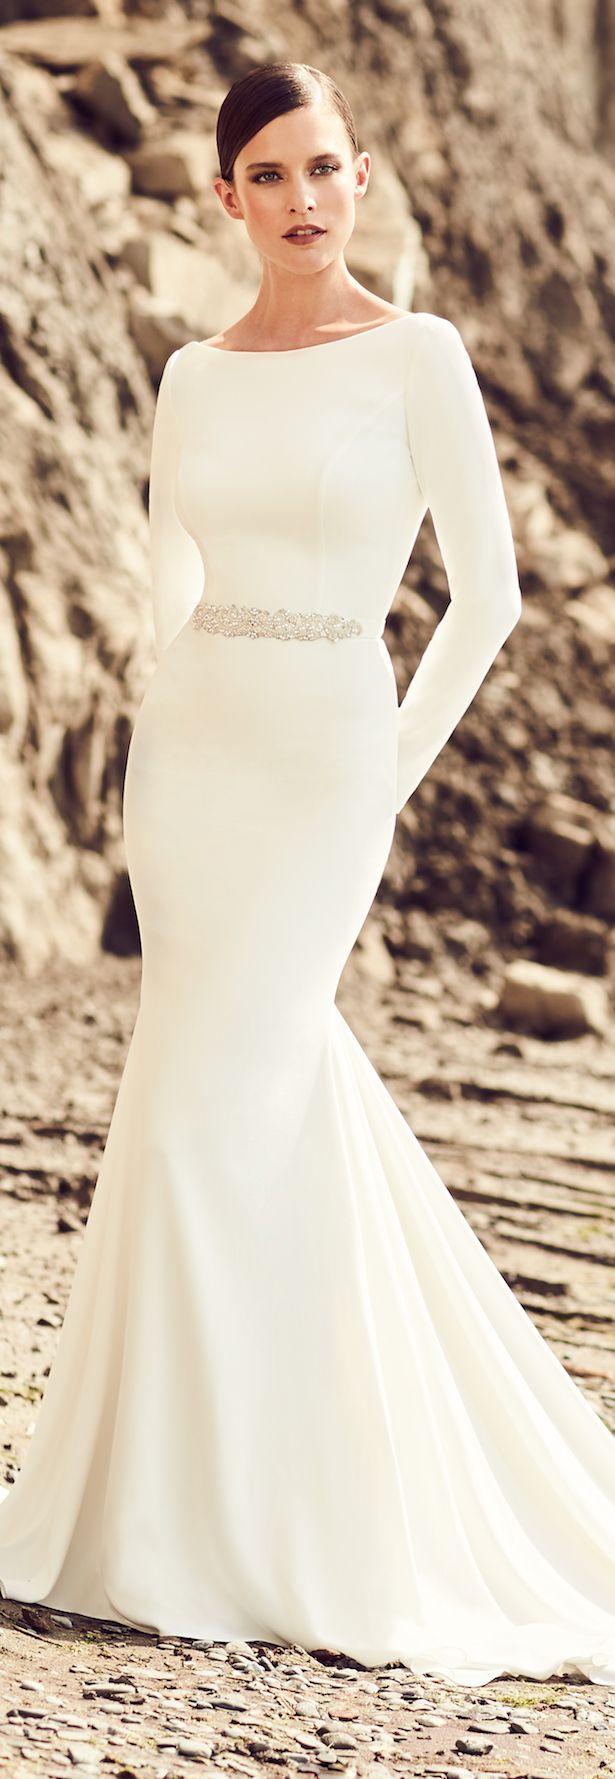 Best 25+ Outdoor wedding dress ideas on Pinterest | Romantic ...